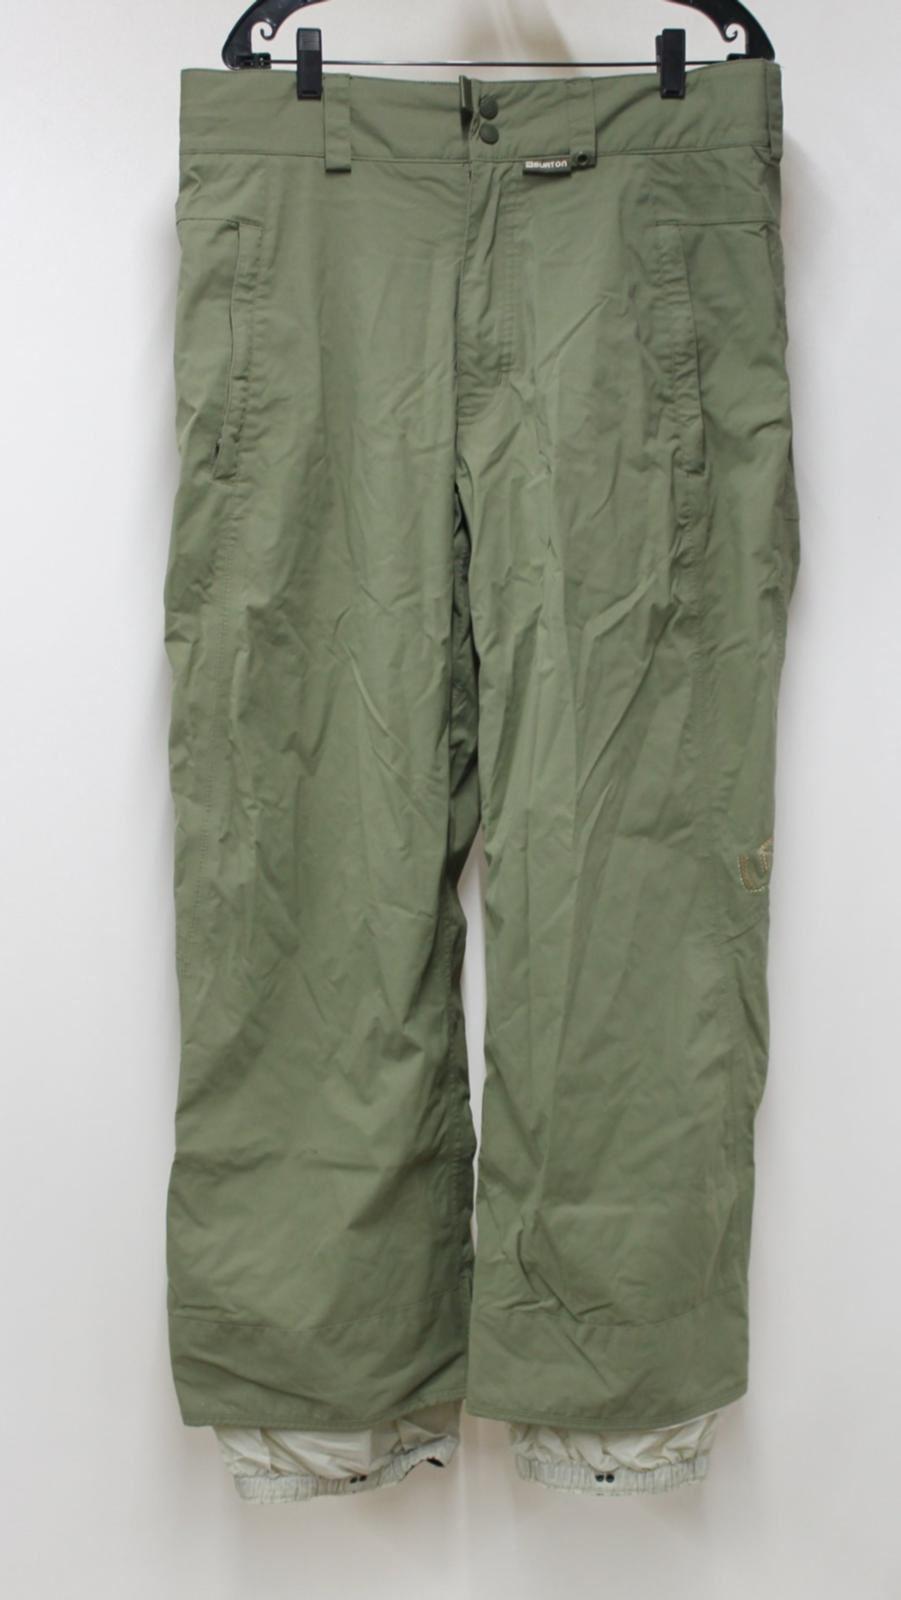 BURTON Men's Green Waterproof Layered Snowboard Skiing Trousers Size L